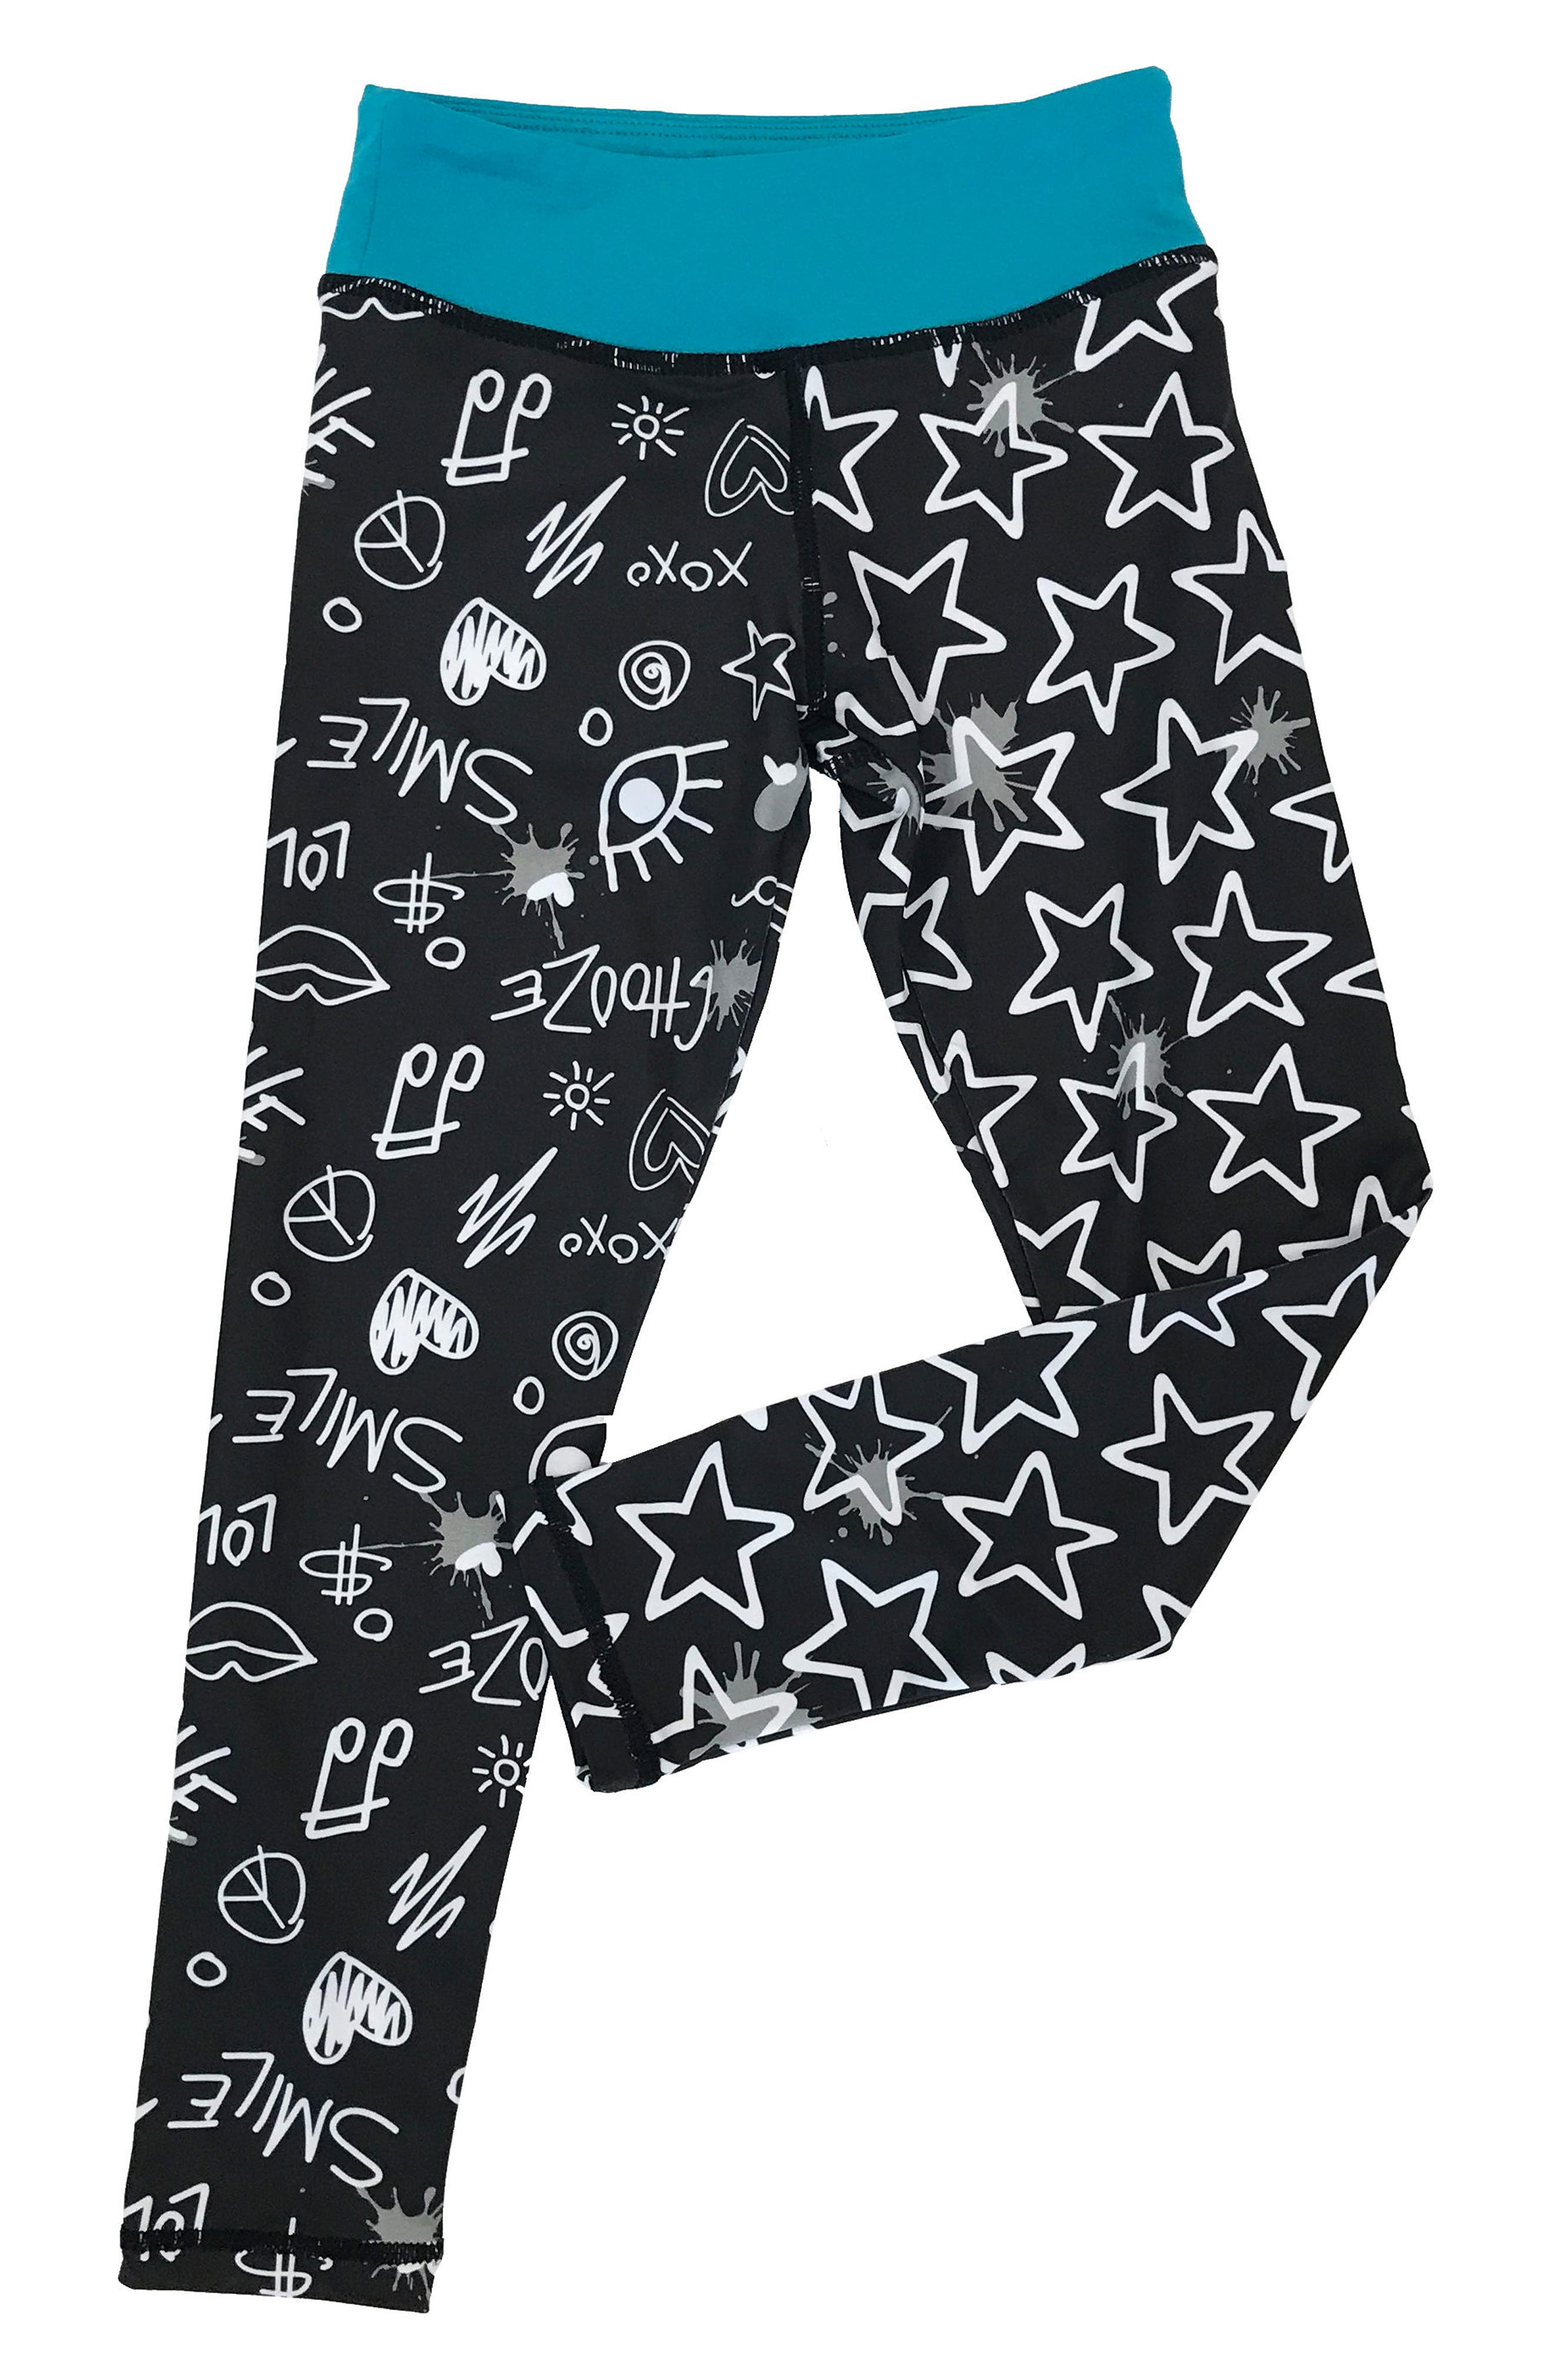 'Splits' Mixed Print Leggings,                         Main,                         color, Draw Black